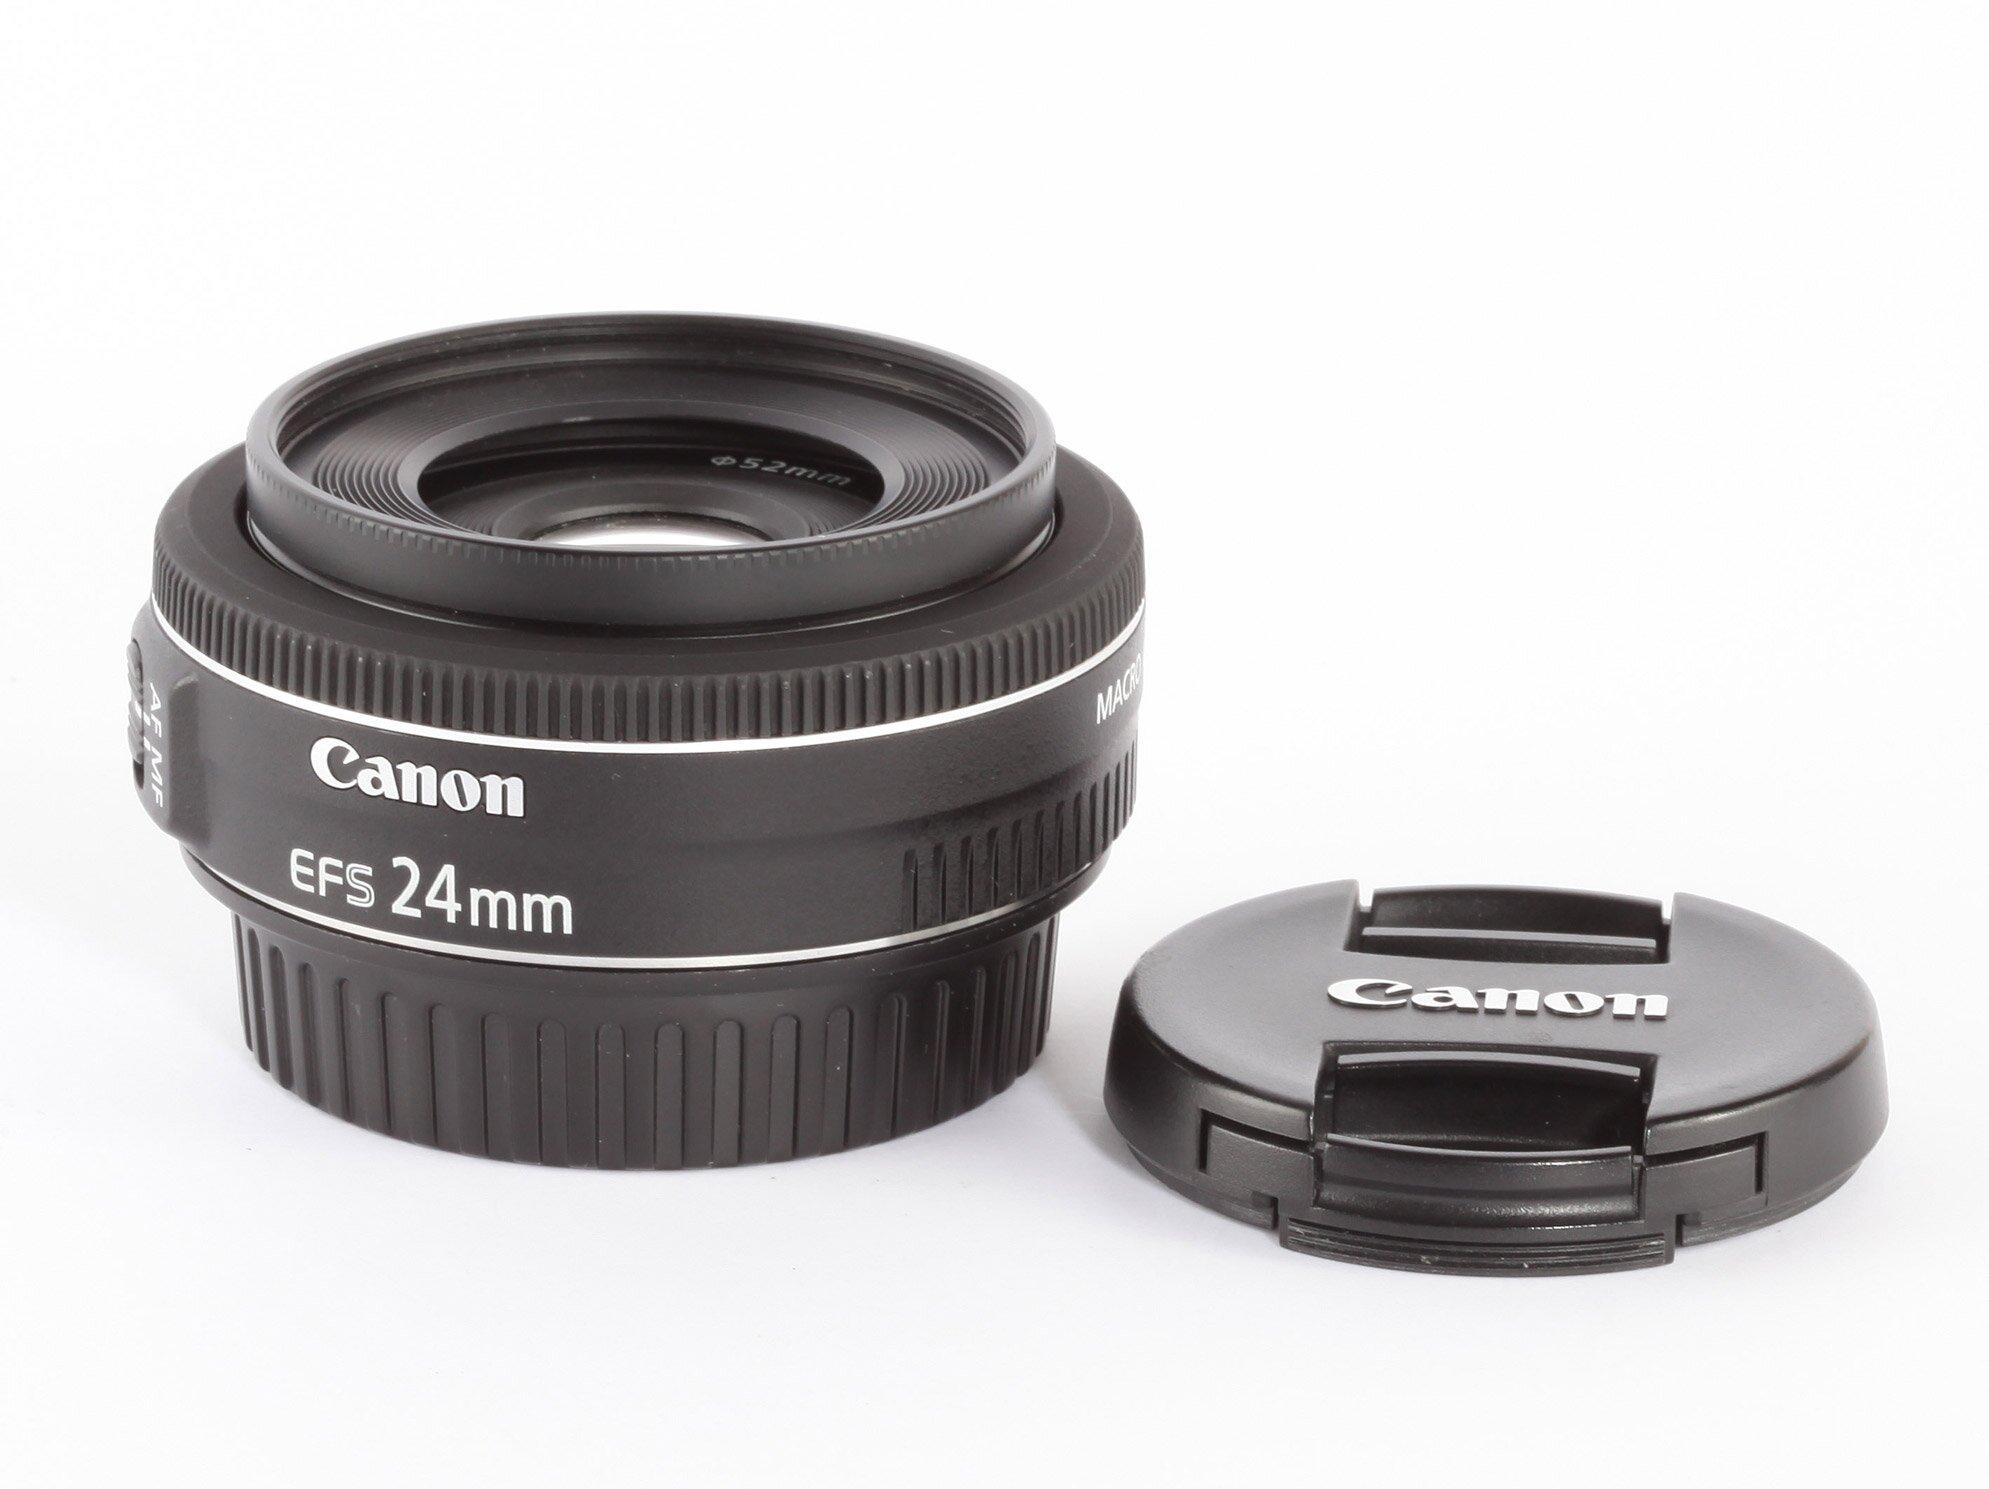 Canon EFS 24mm 2,8 STM